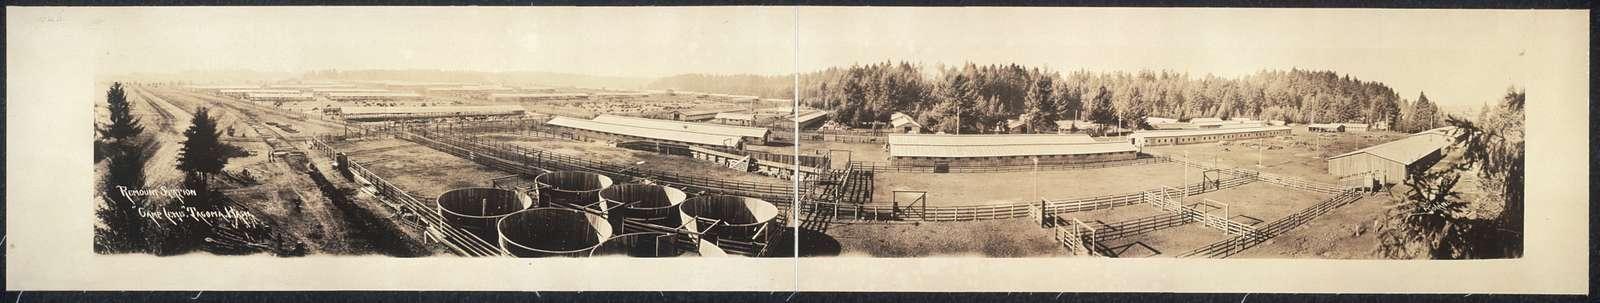 "Remount Station, ""Camp Lewis"", Tacoma, Wash."